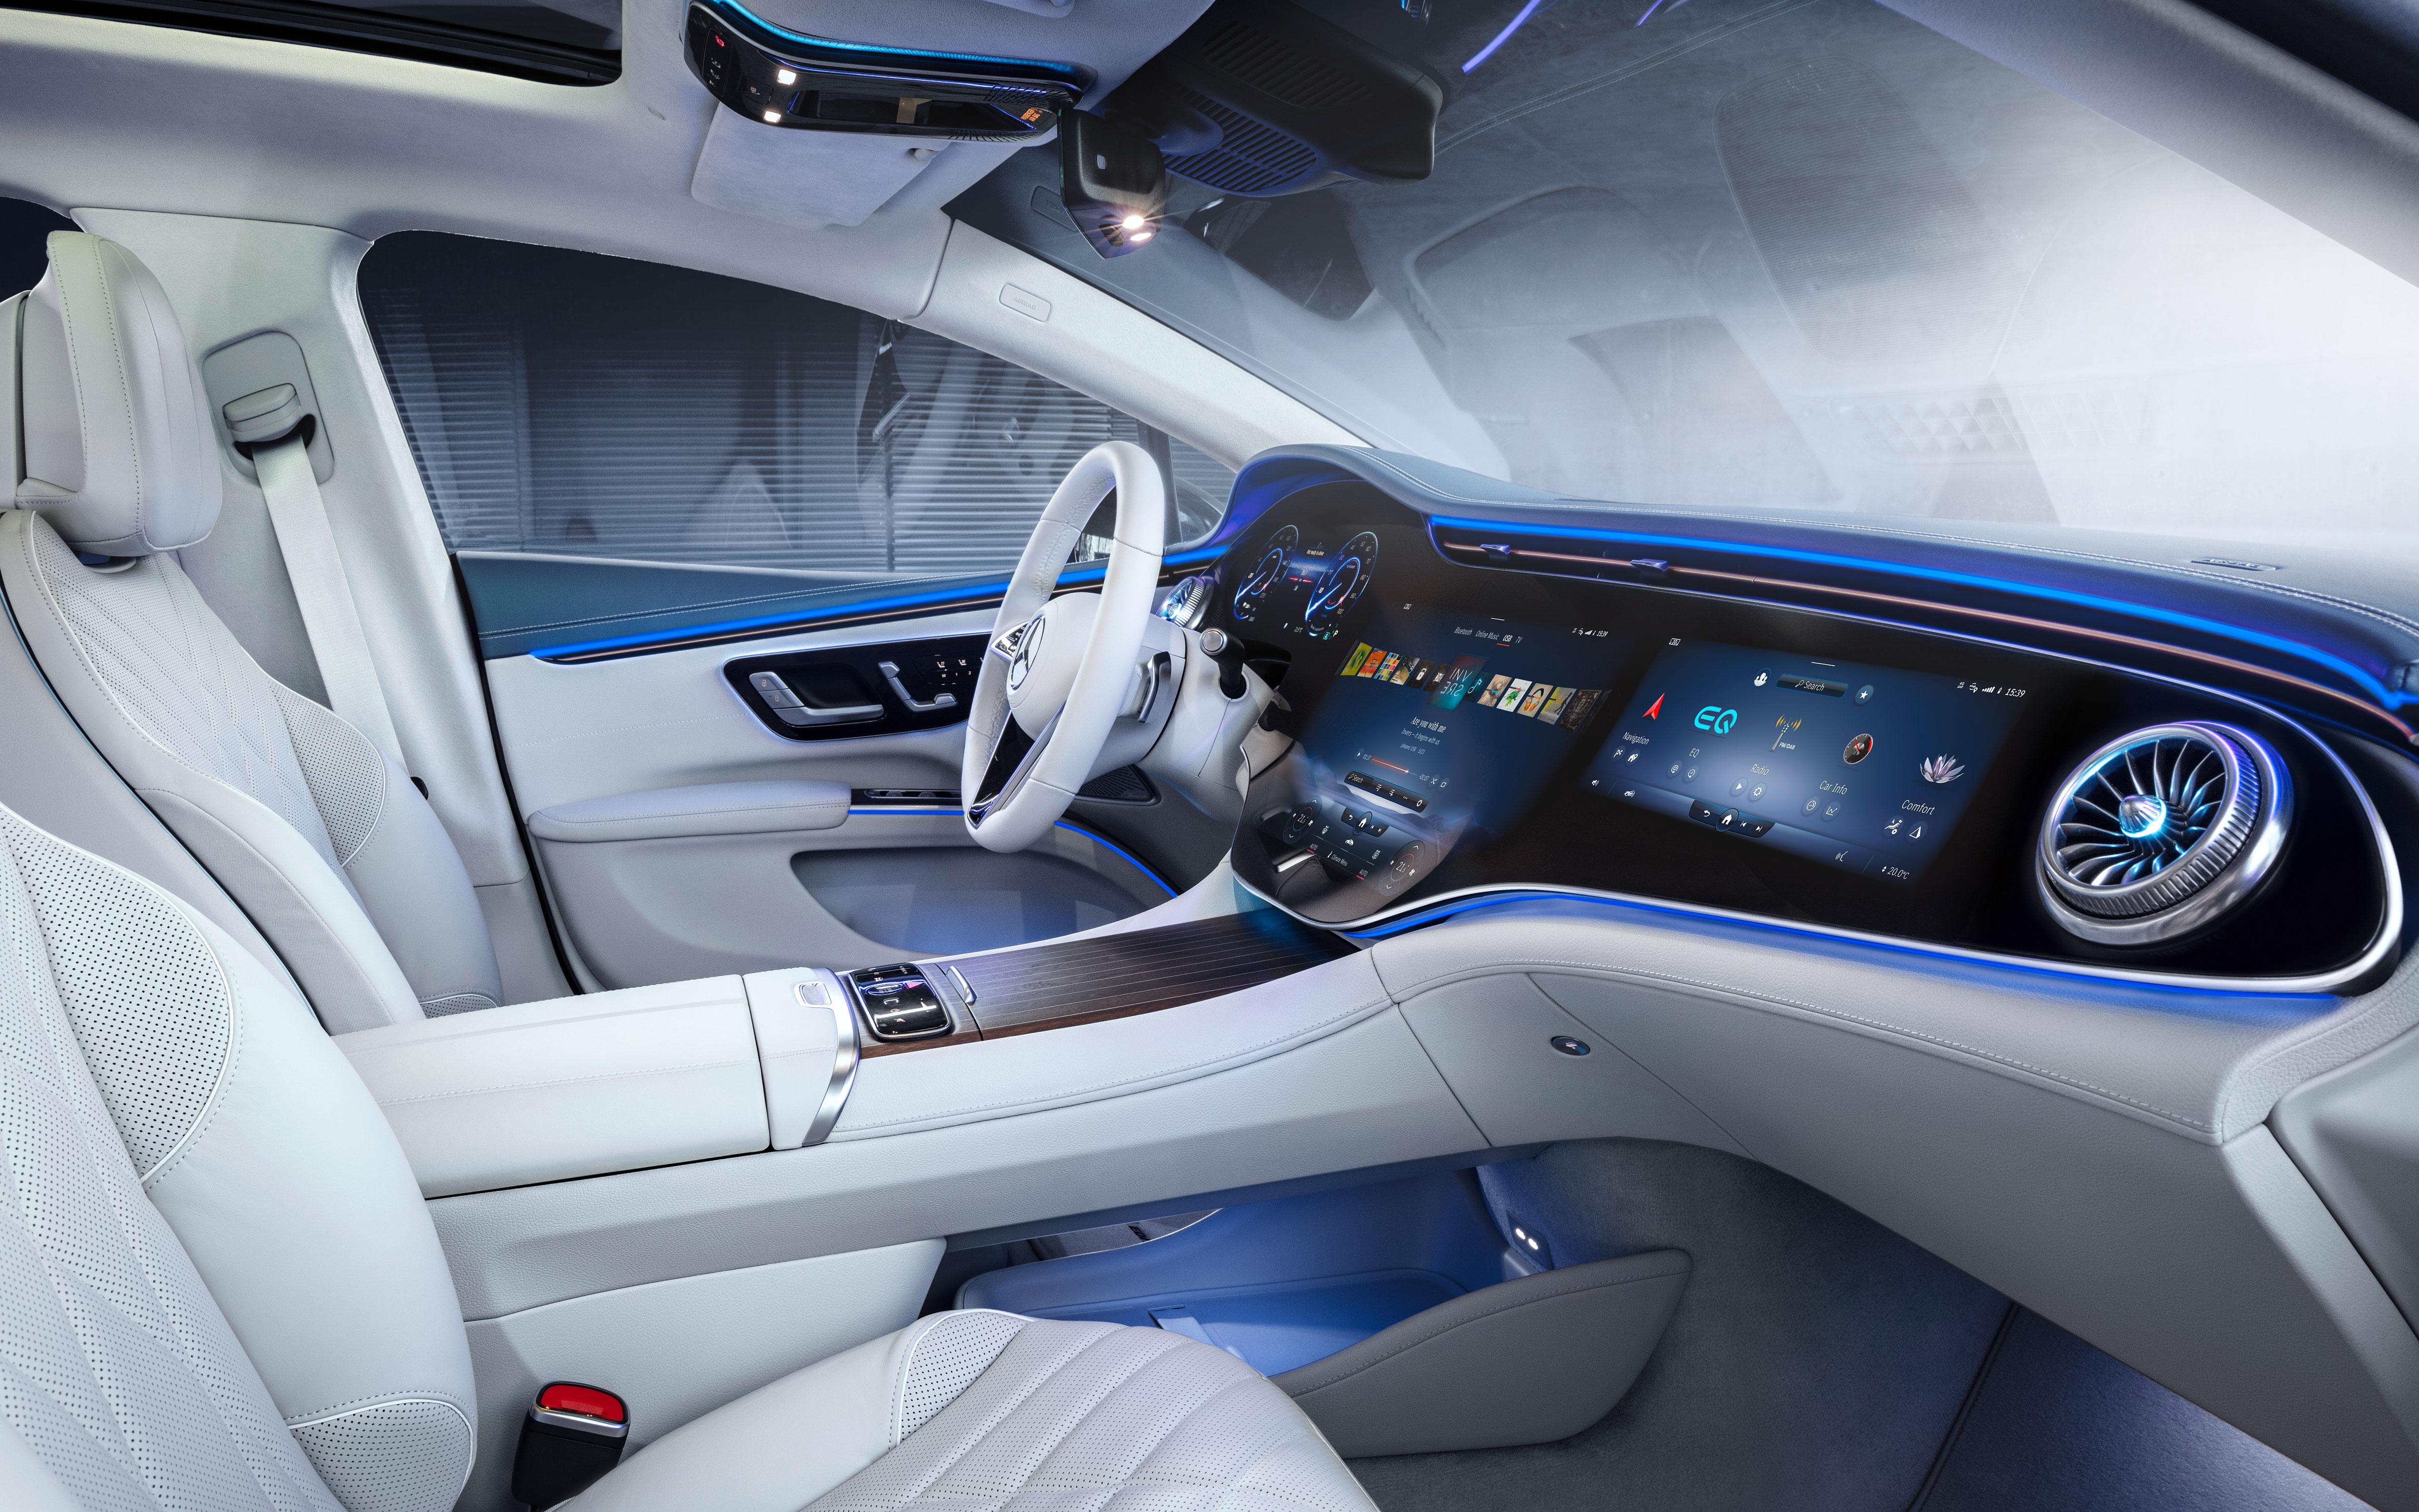 Undated handout image of the Mercedes-Benz EQS all-electric sedan. Mercedes-Benz/Handout via REUTERS